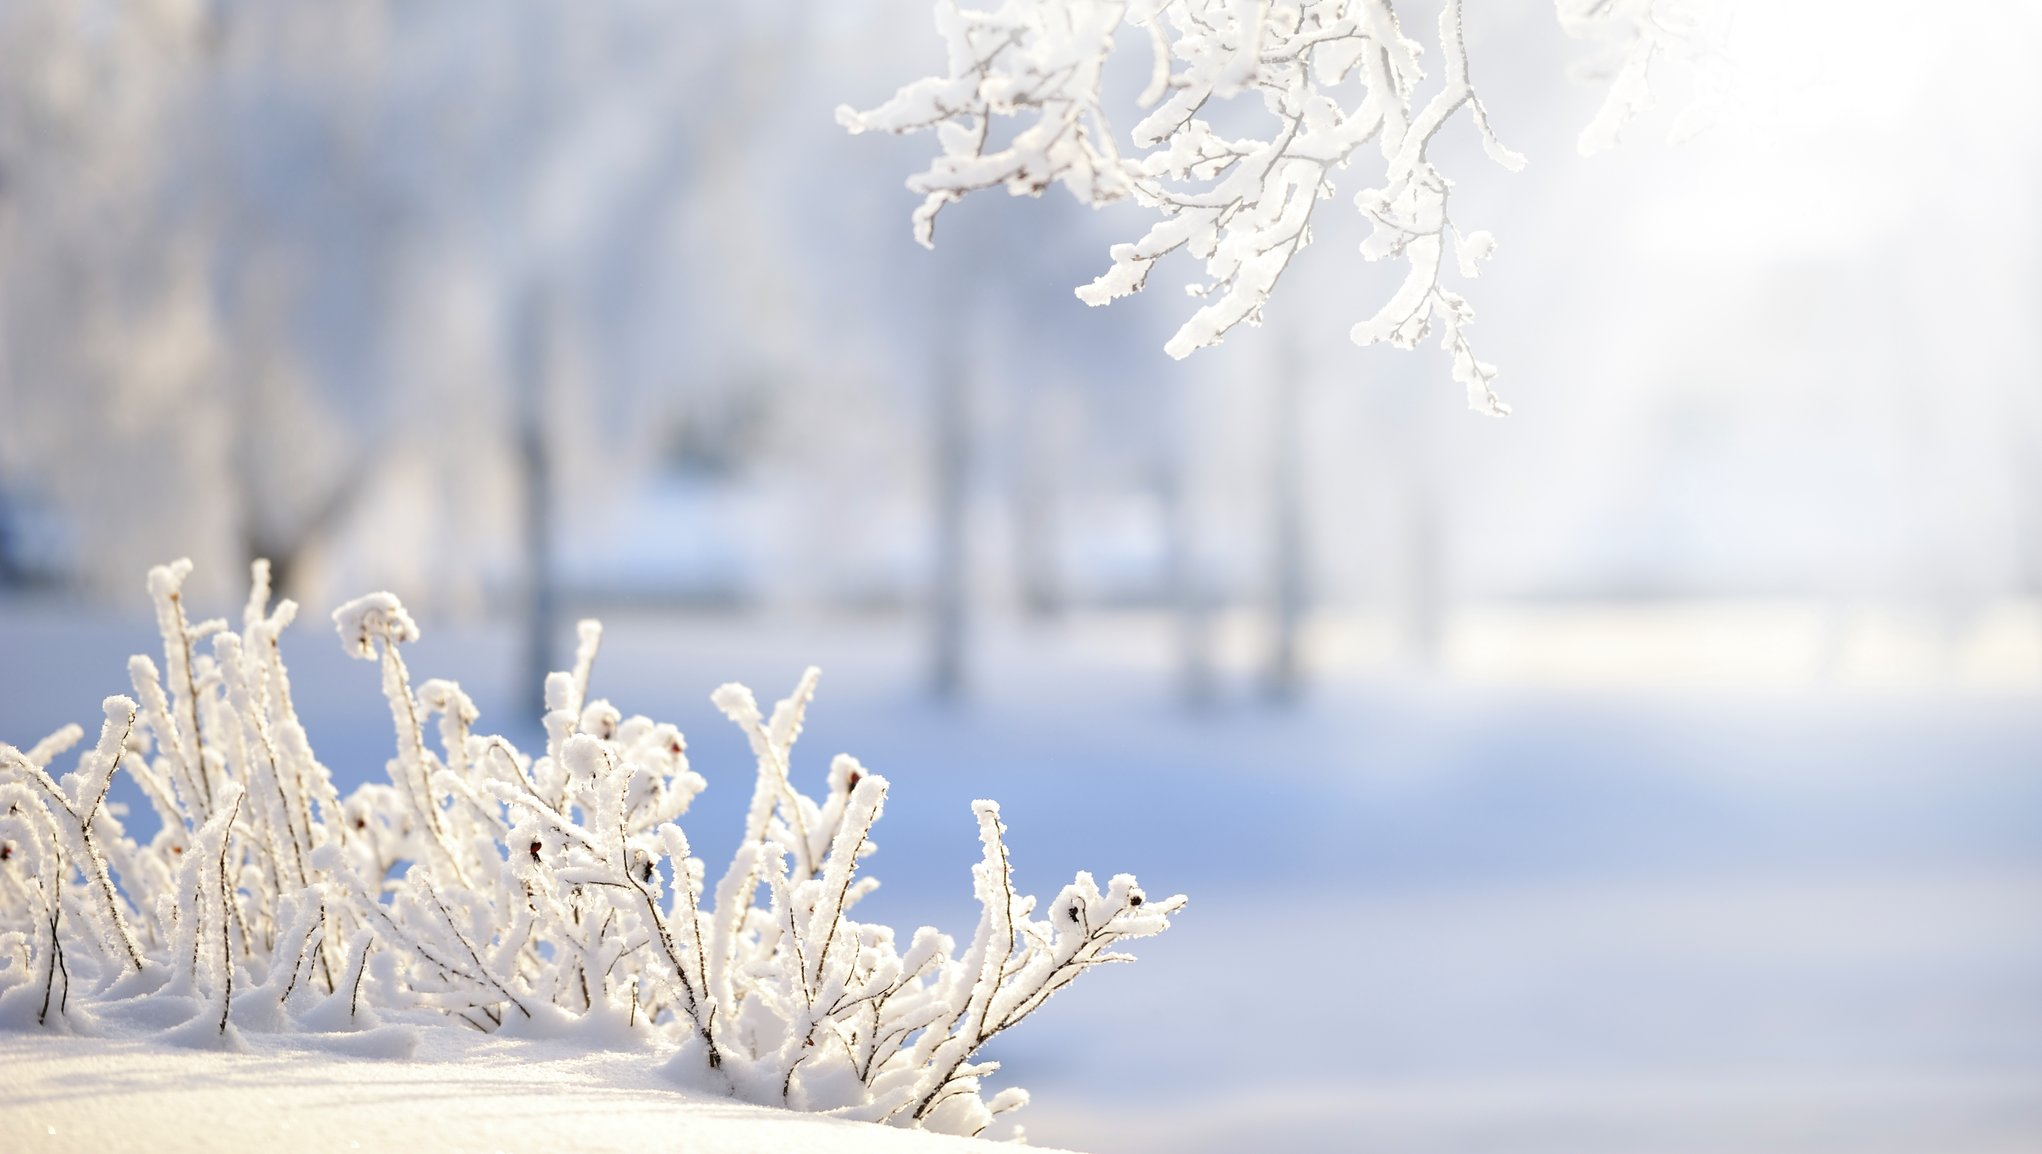 Säkrare vinter